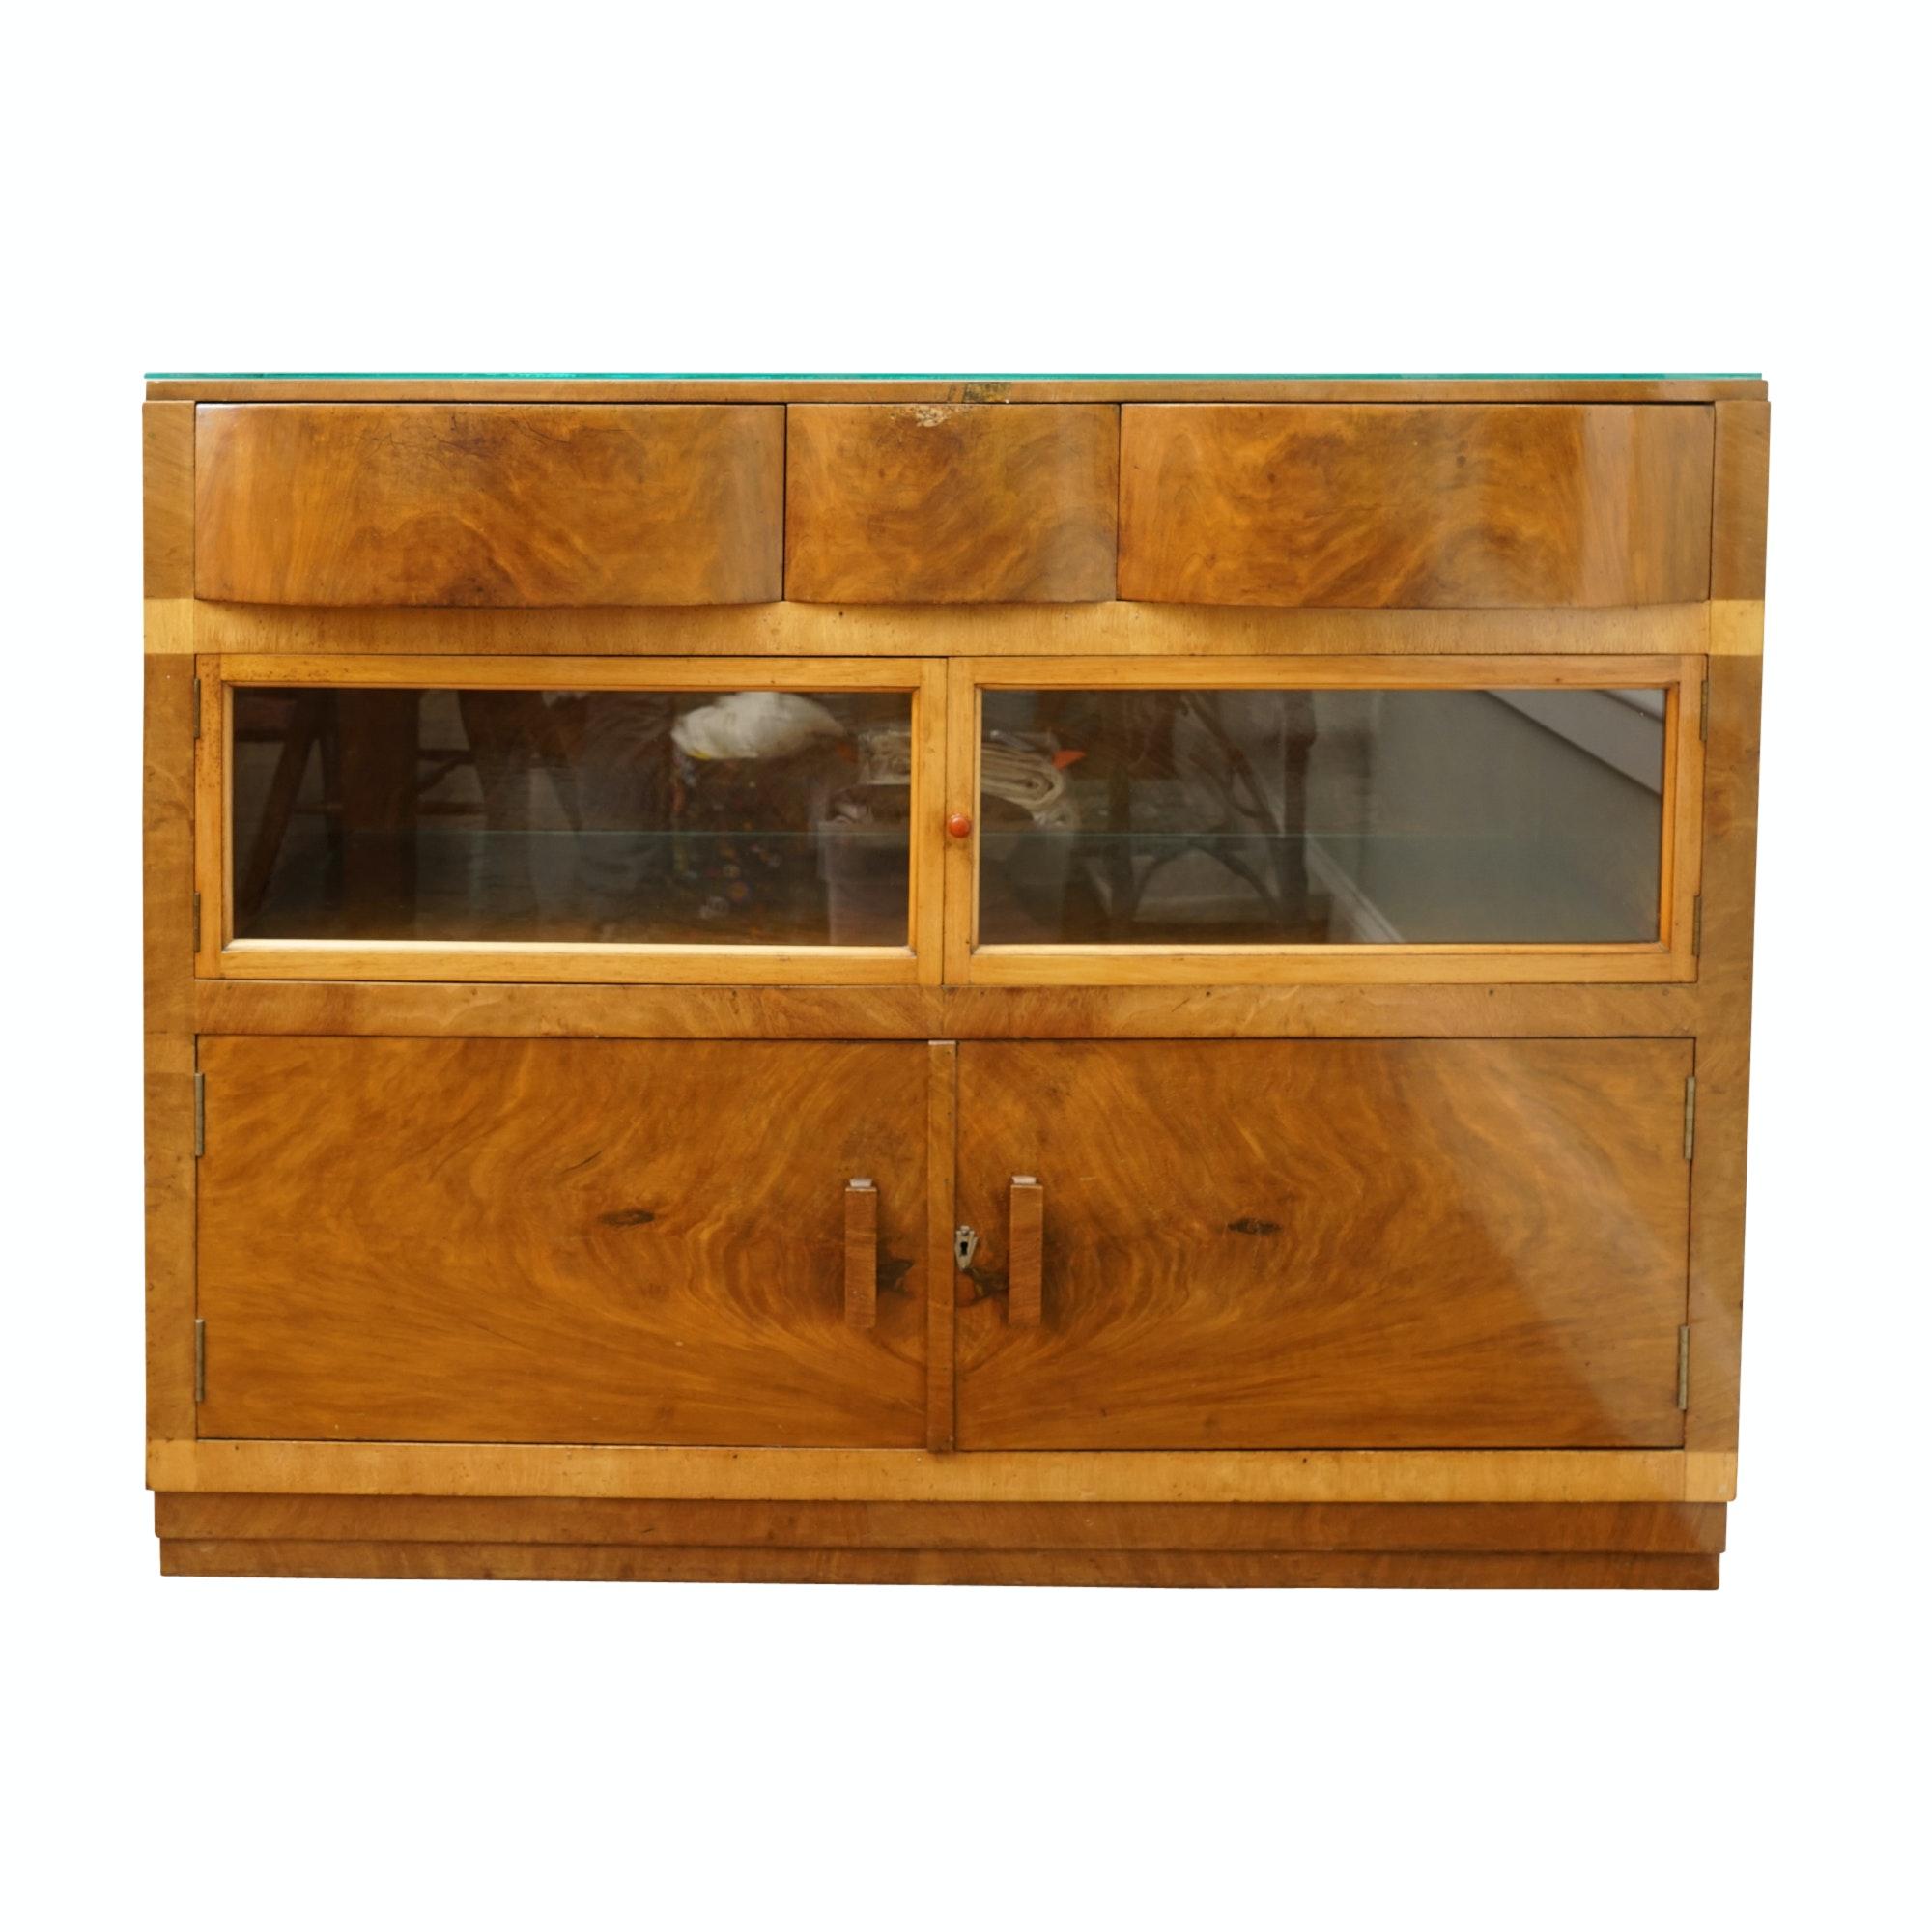 English Art Deco Walnut and Birch Sideboard by M.P. Davis